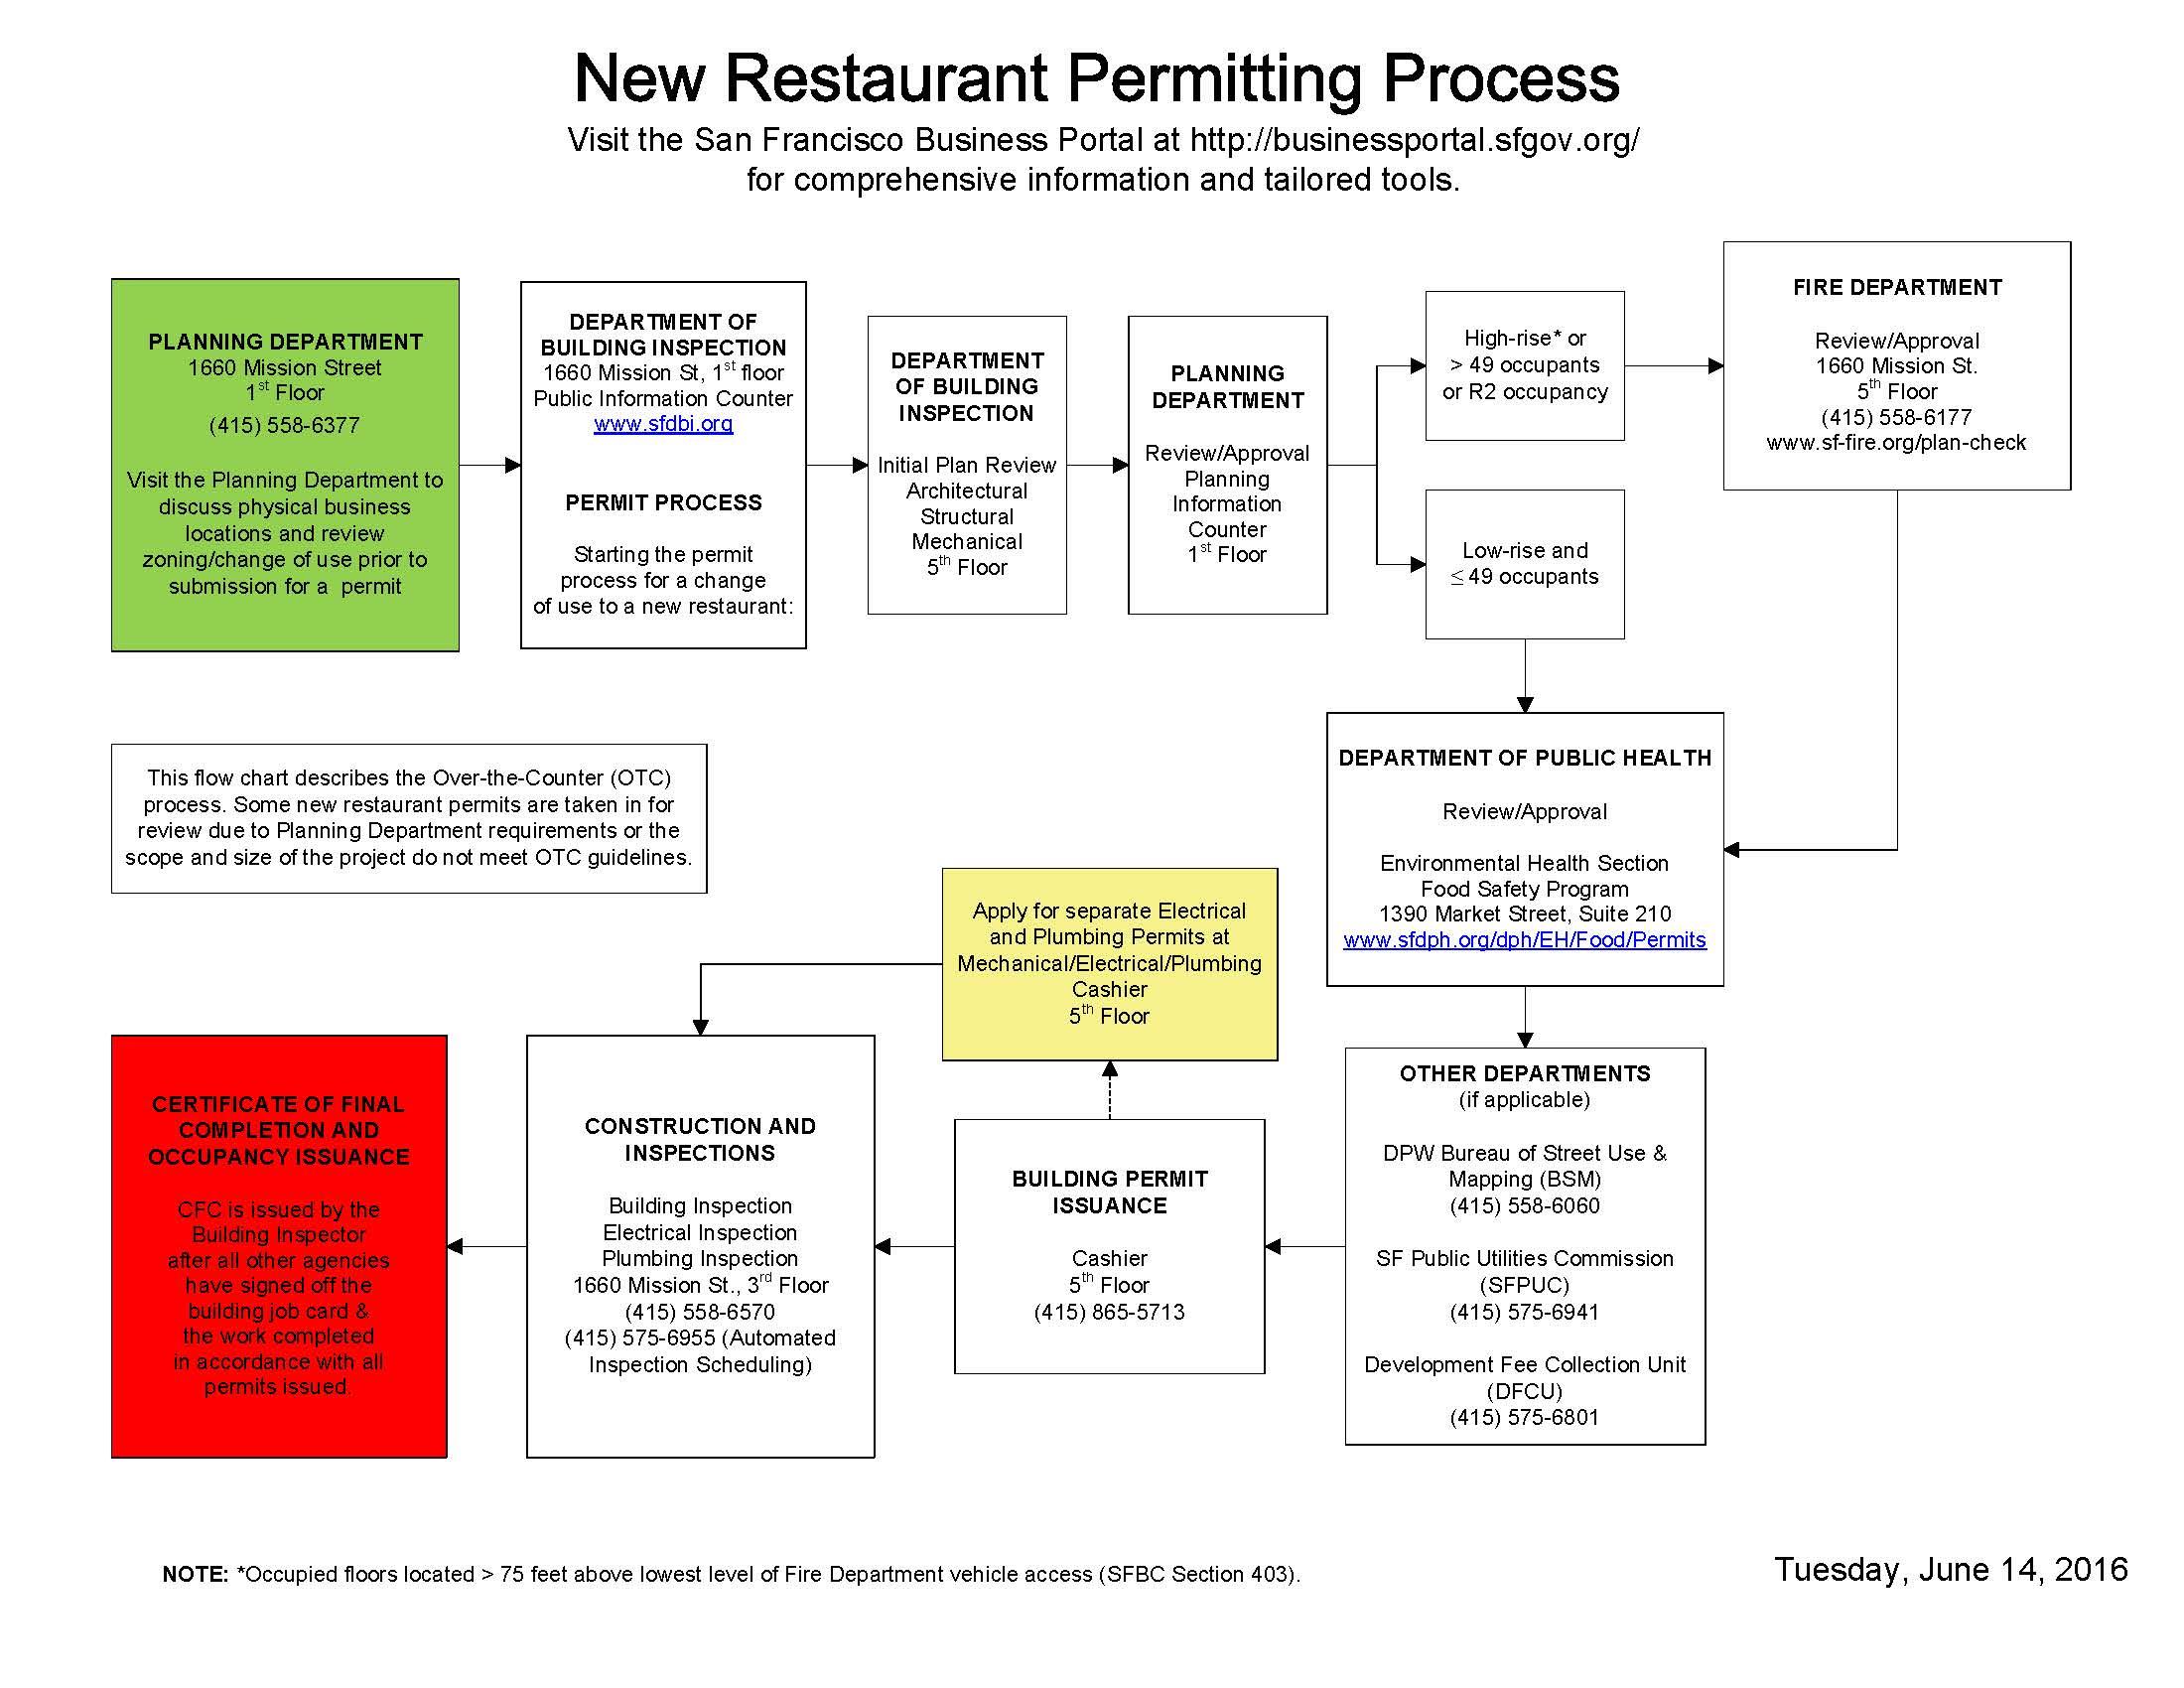 Restaurant permitting process department of building inspection restaurant permit process flowchart geenschuldenfo Choice Image